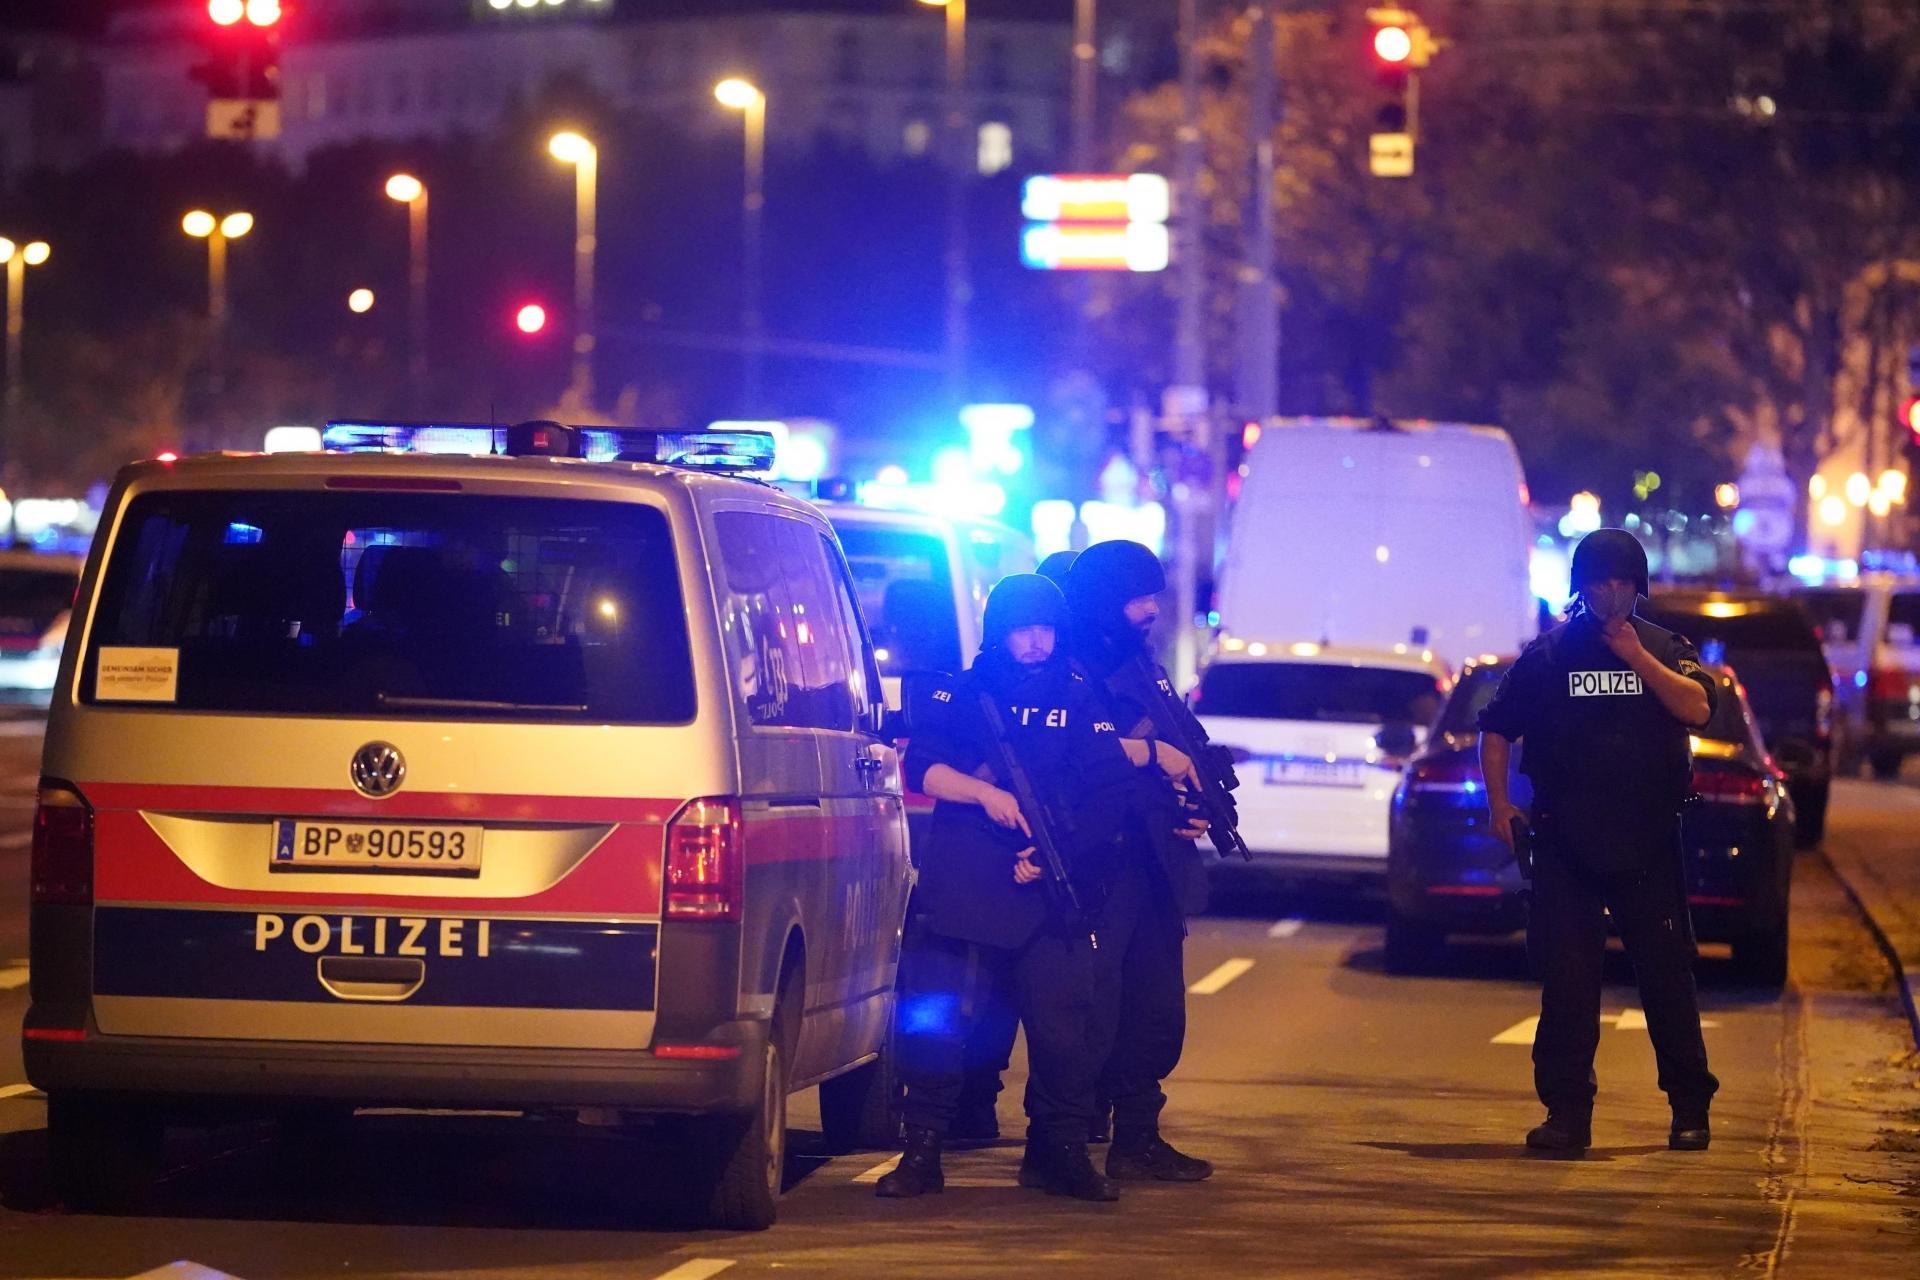 Gunman on the run after Vienna 'terror attack